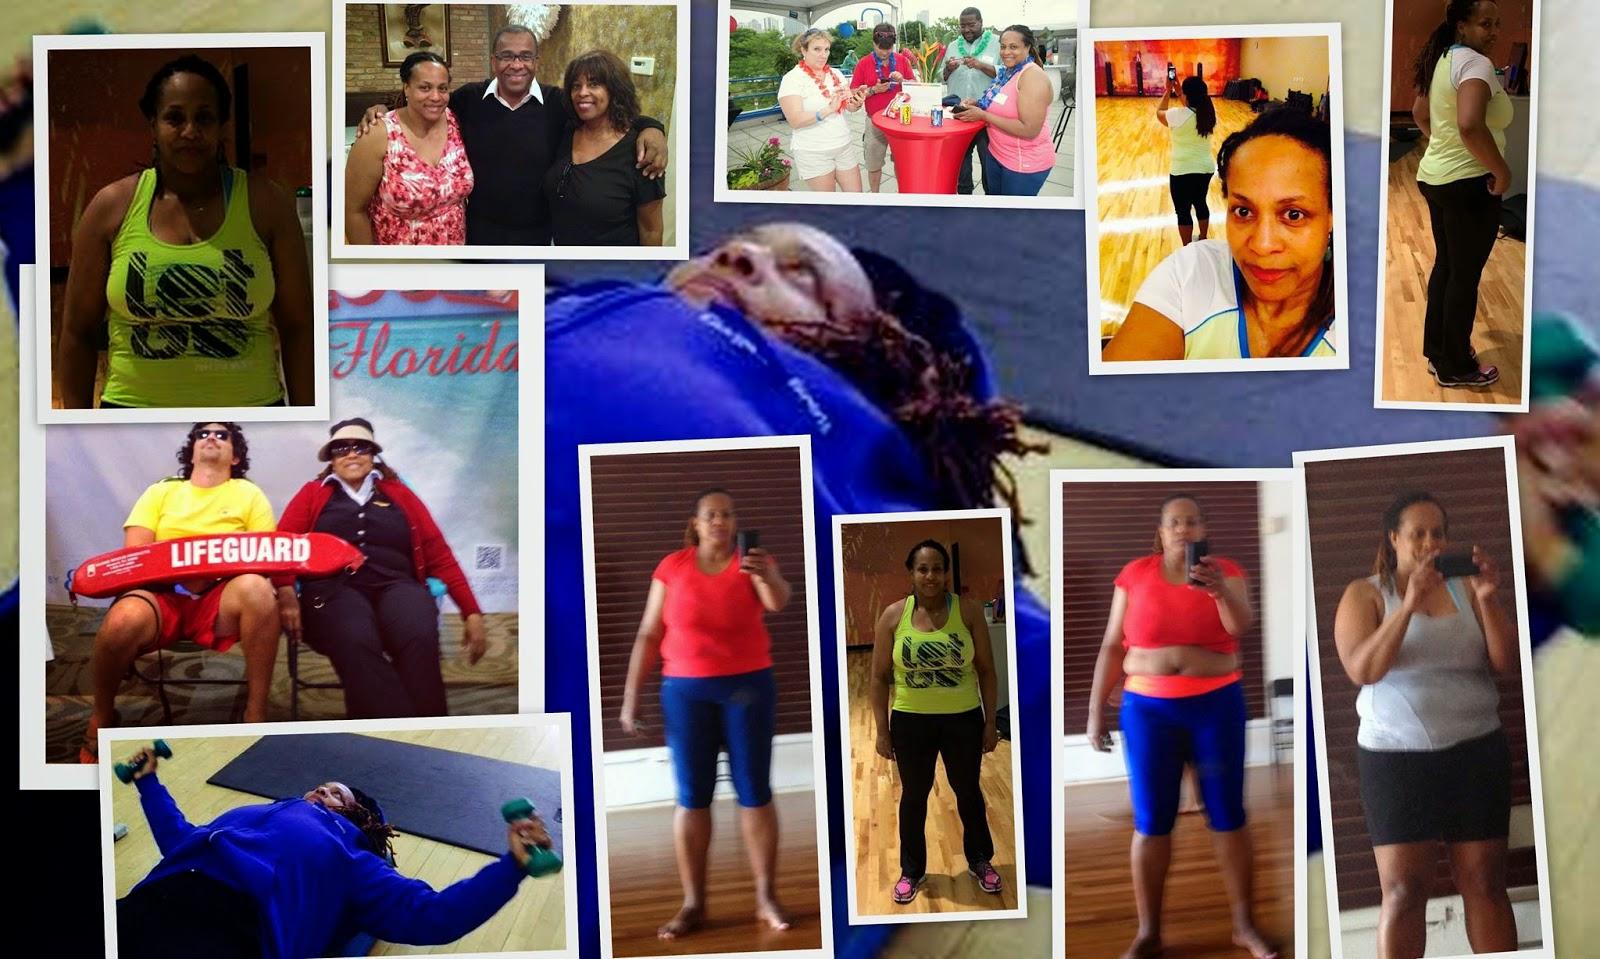 Janice's Weightloss Progress May 2014 to February 2015